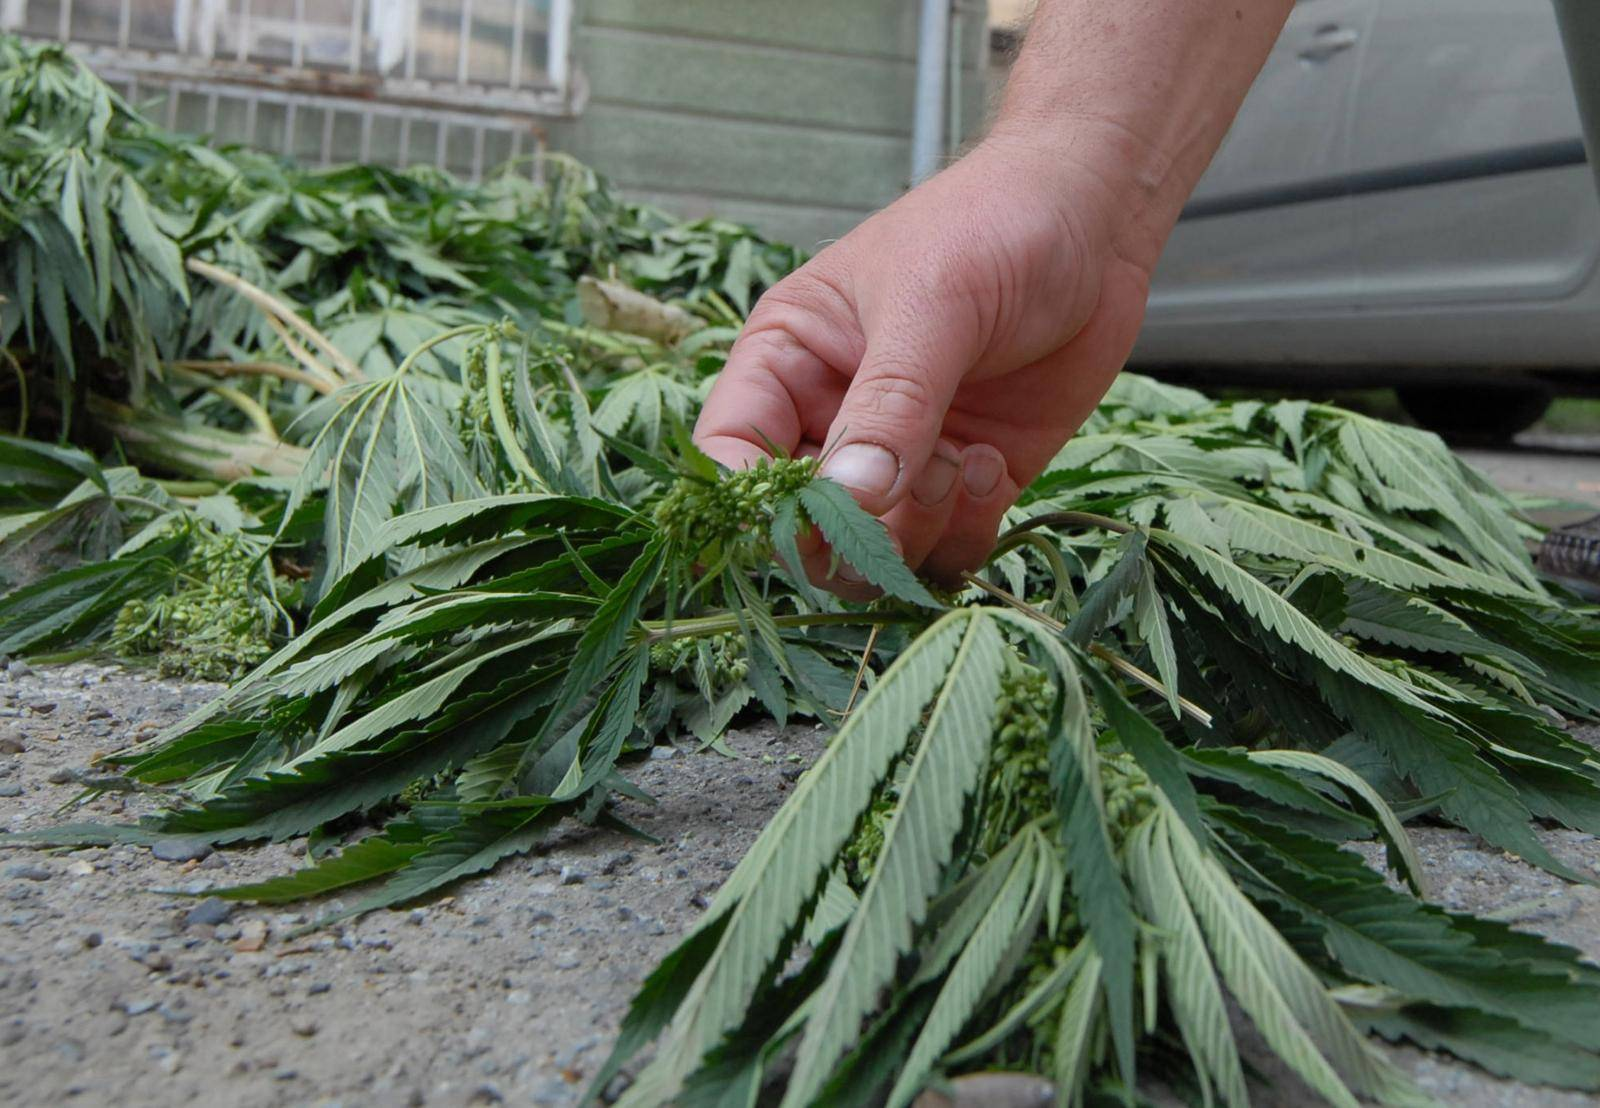 Trogir: Policija je uhitila dilera sa 17 kilograma marihuane